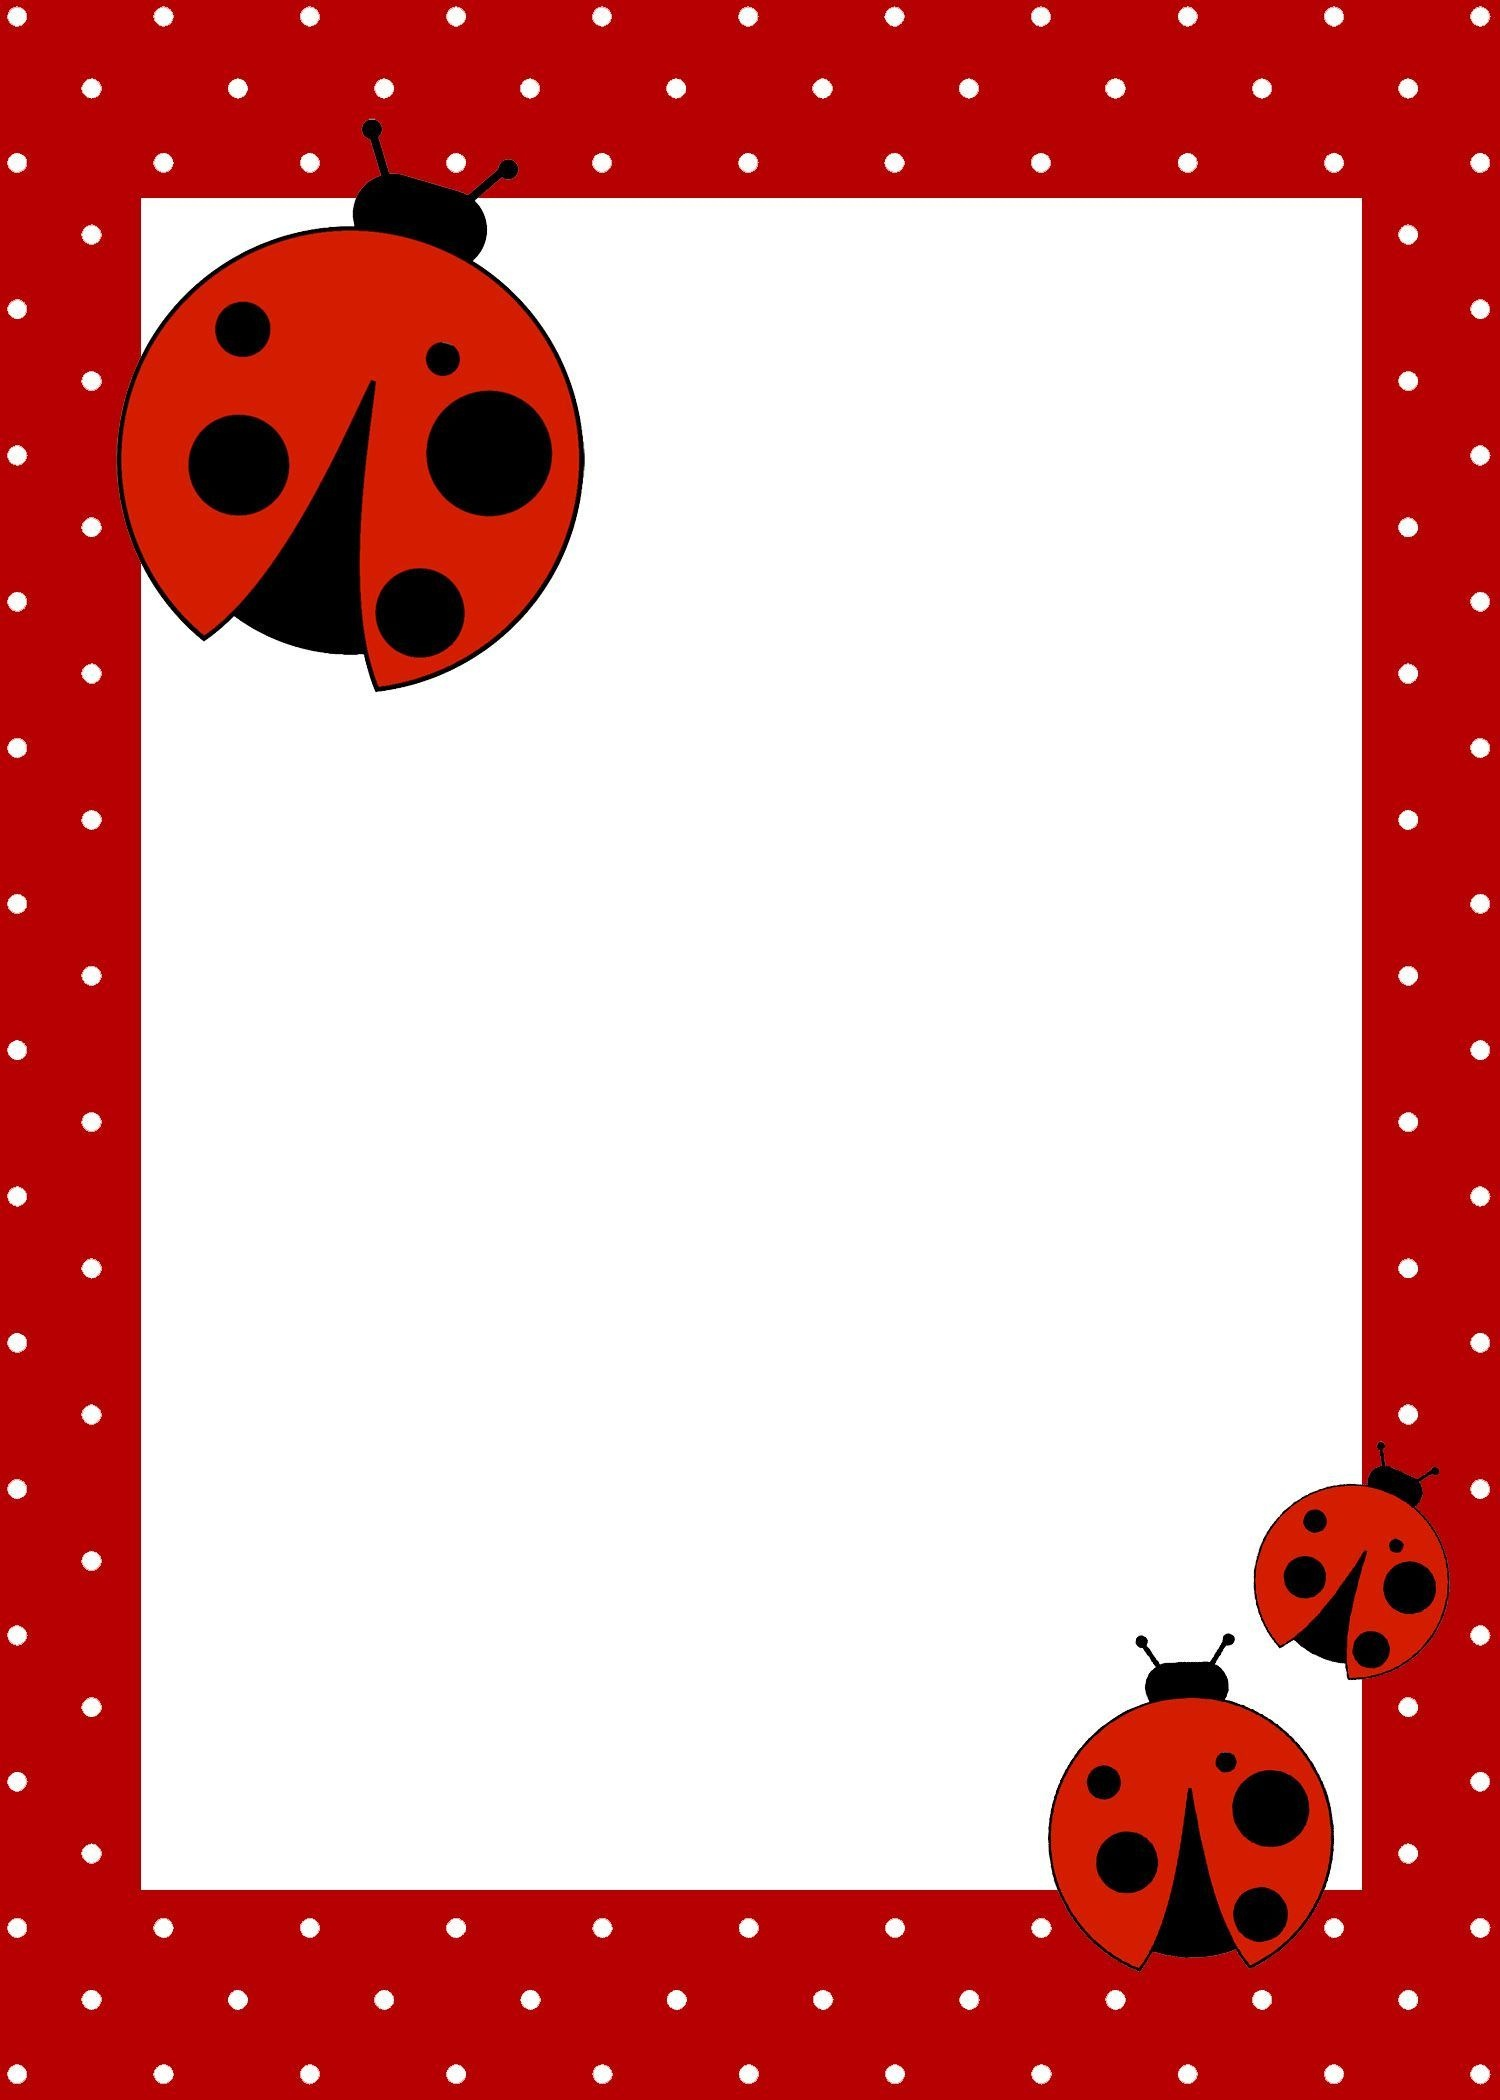 Ladybug Baby Shower Invitations Unique Birthday Free Template - Free Printable Ladybug Invitations